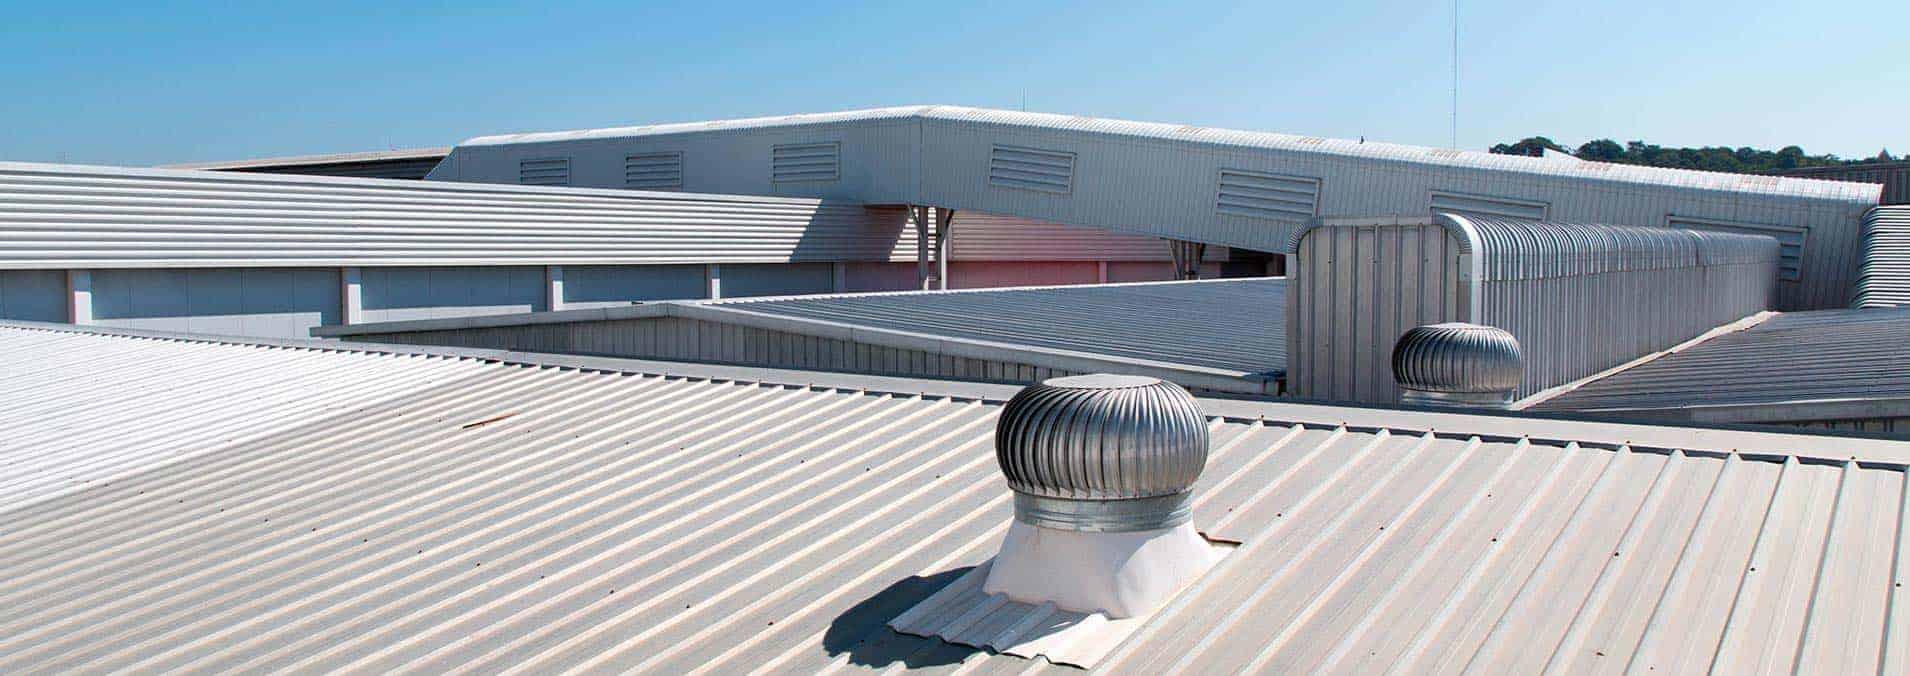 Commercial Roofing Atlanta, GA